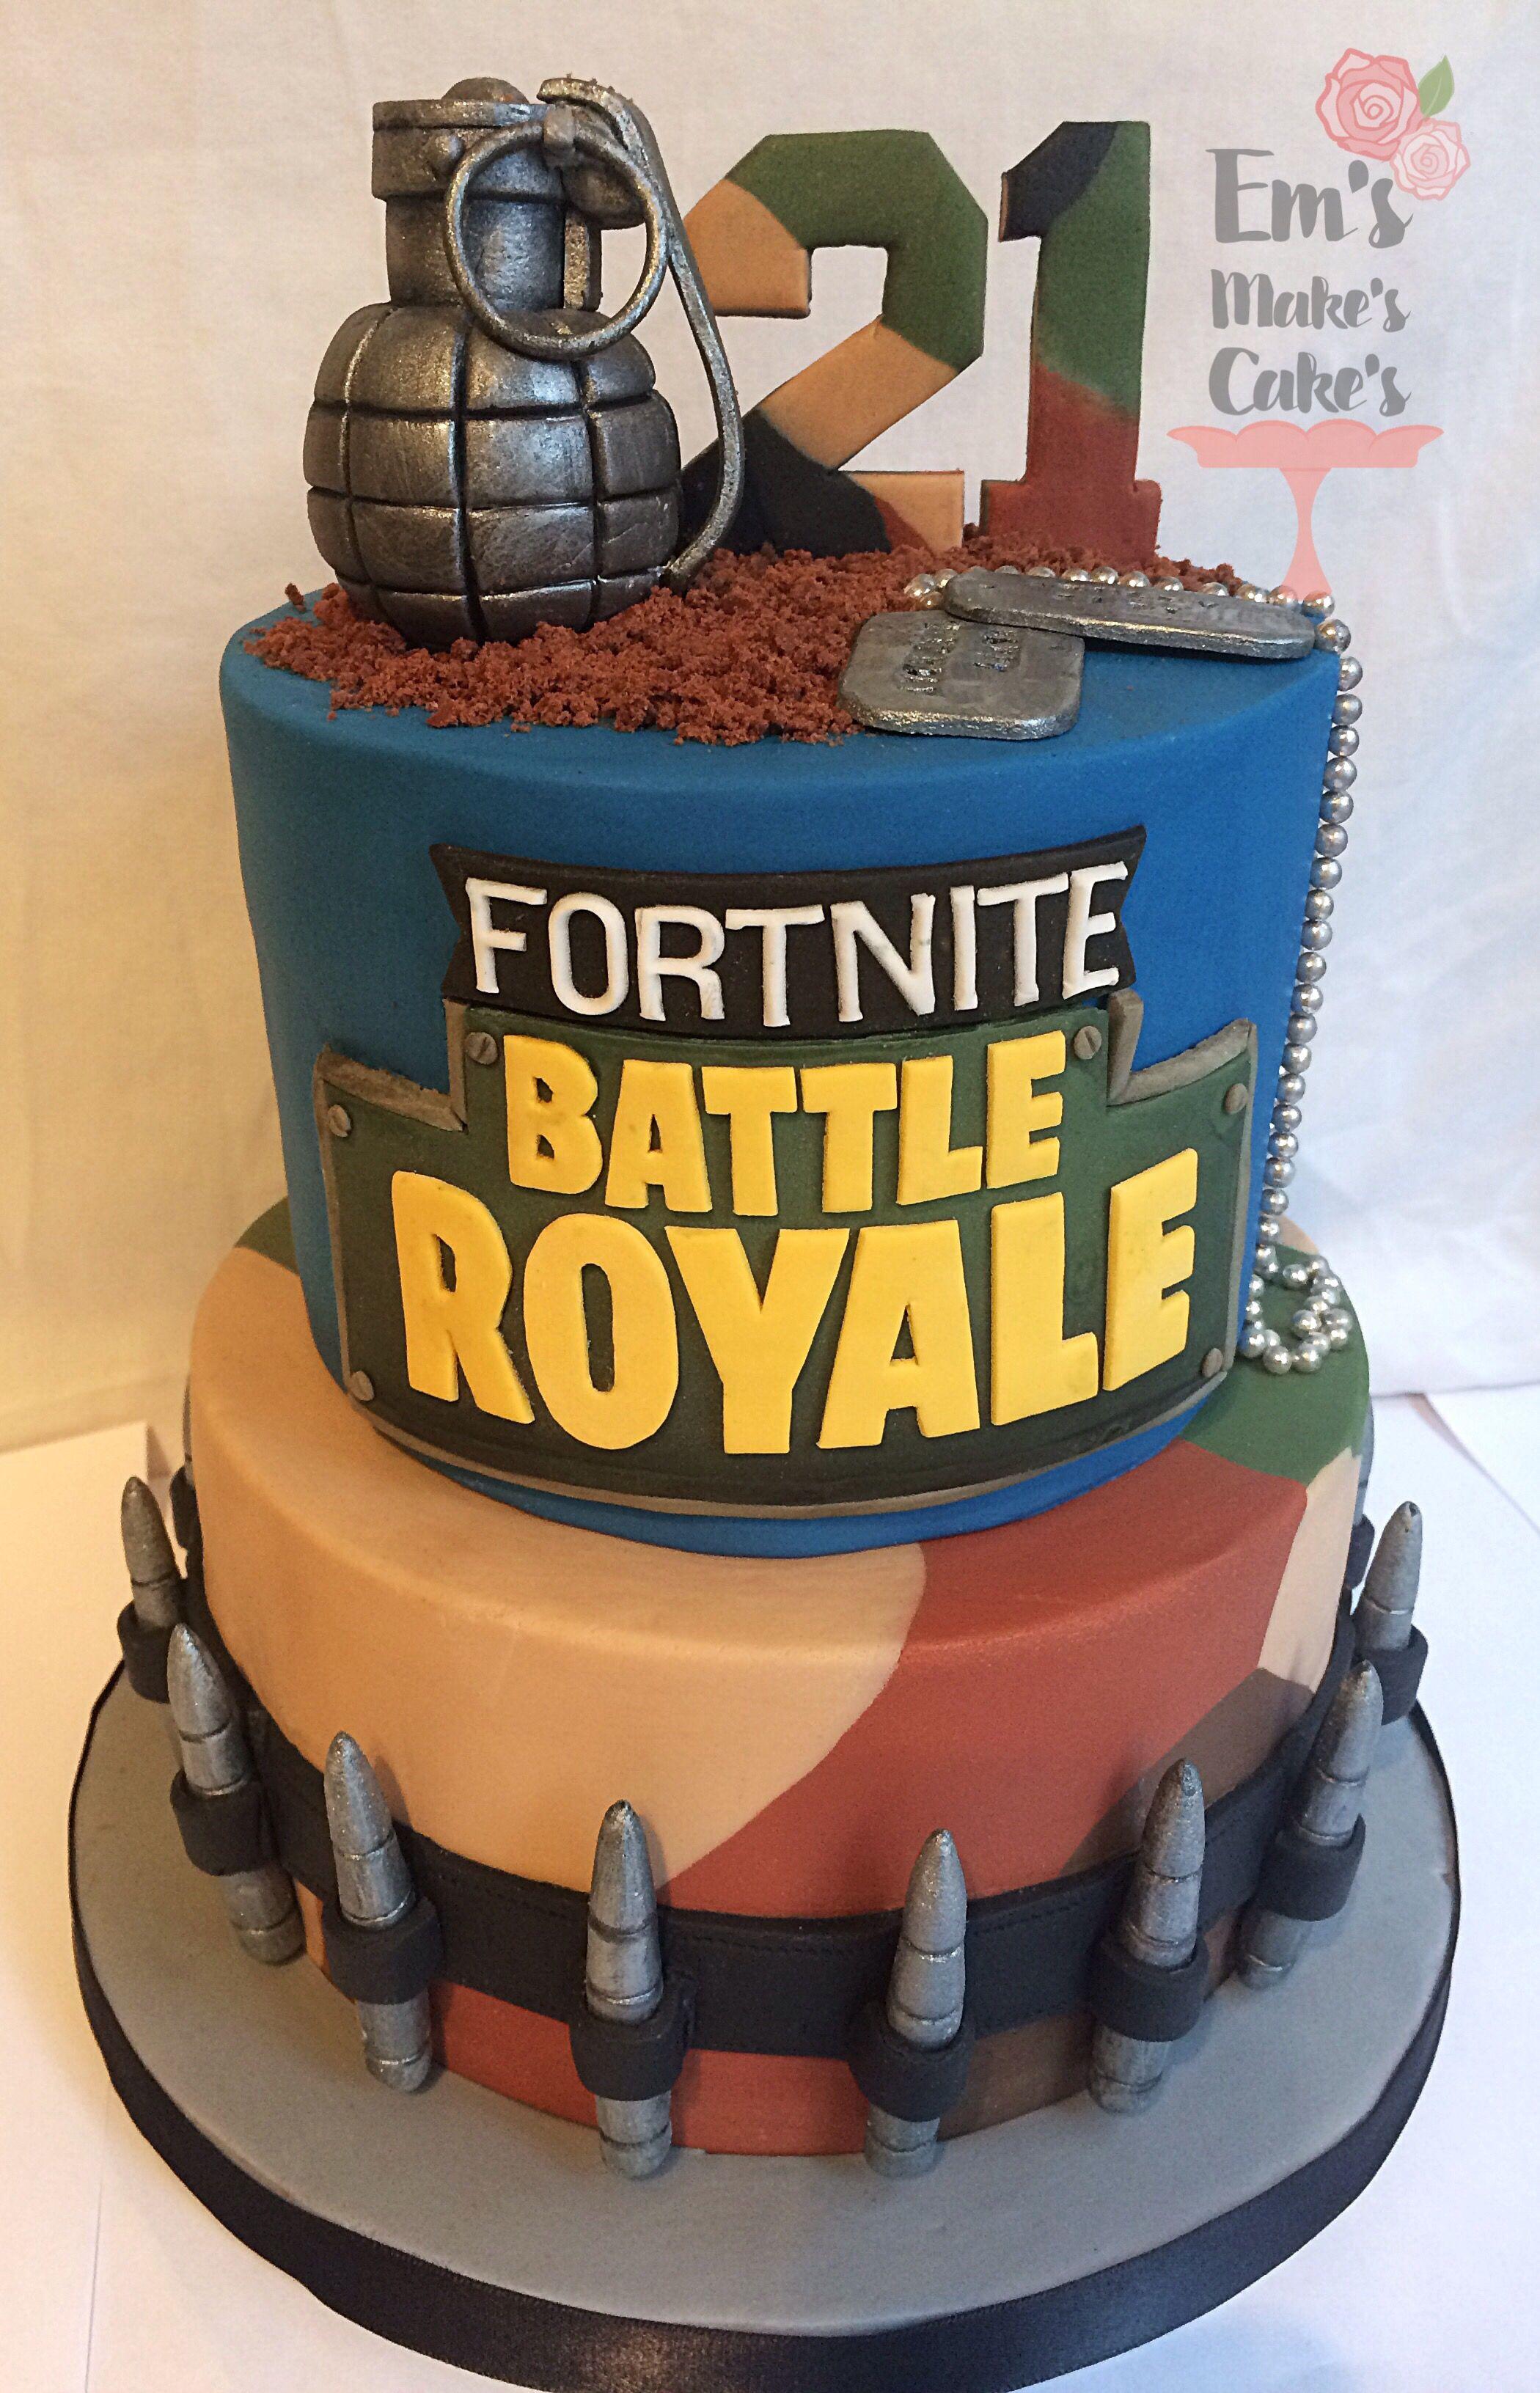 Battle Royal Fortnite Cake Royal Cakes Cake Themed Birthday Cakes